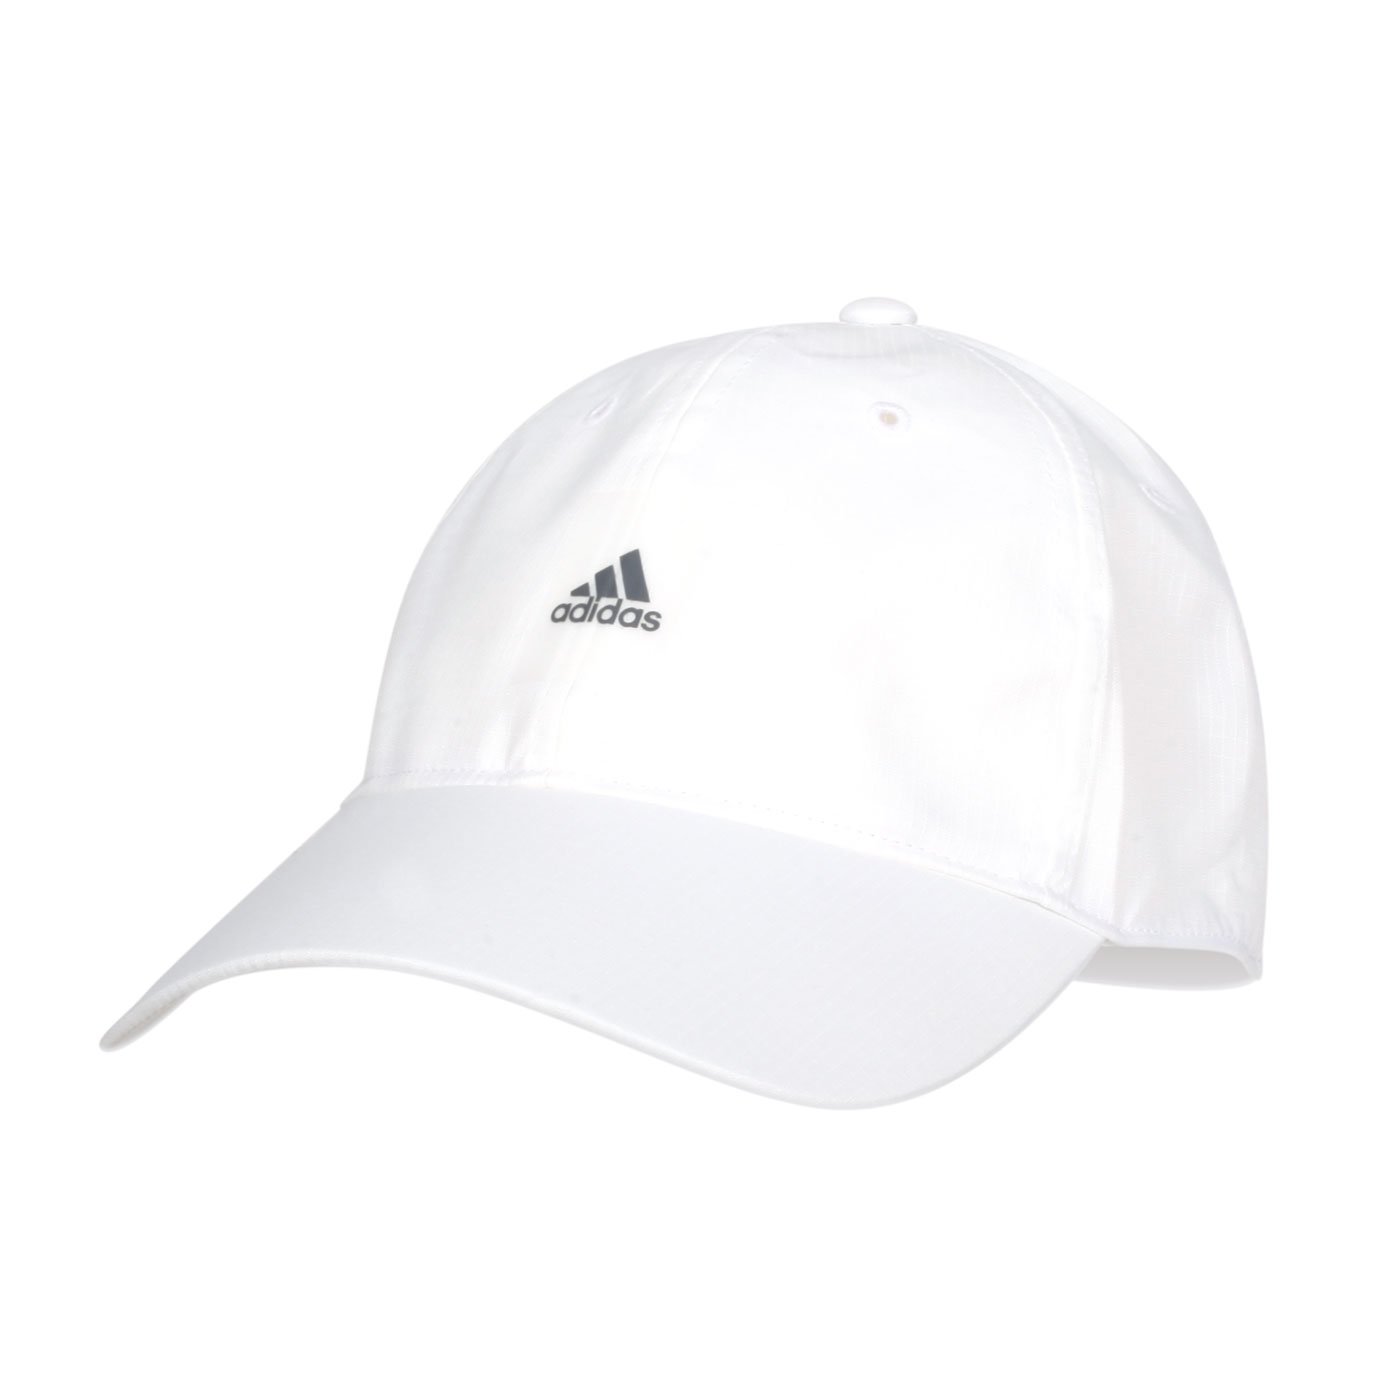 ADIDAS 帽子 GN2003